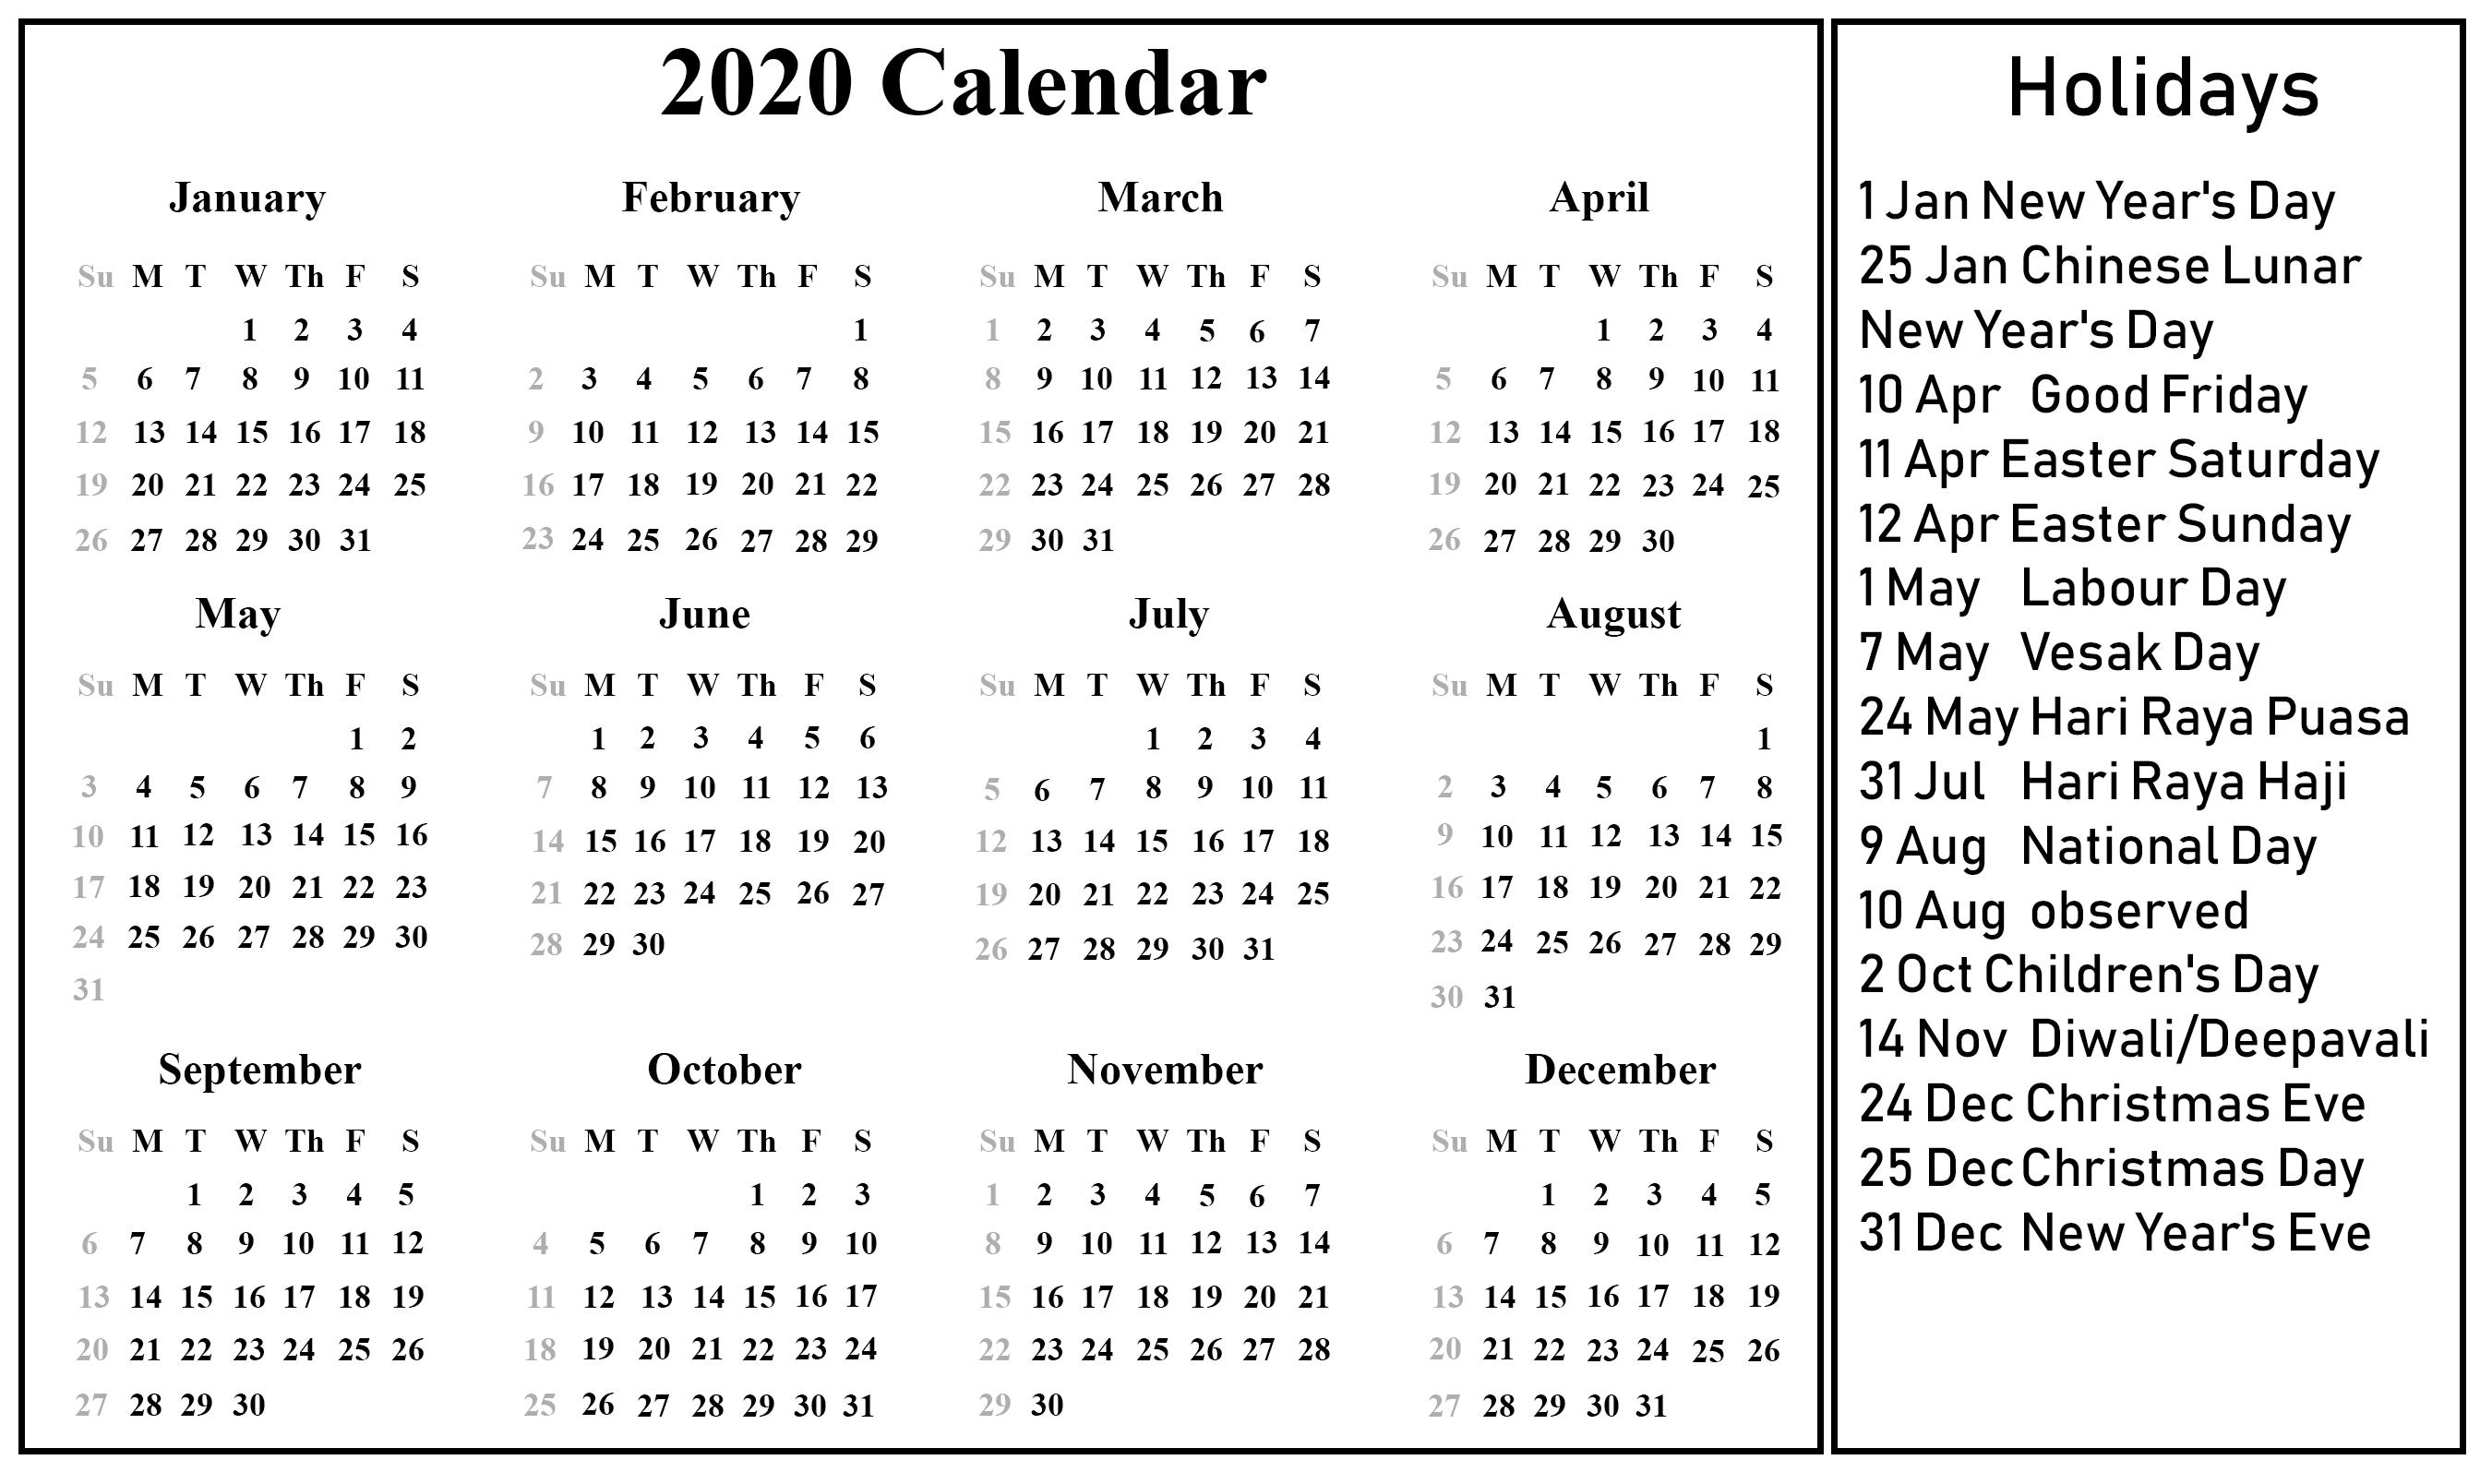 Singapore 2020 Printable Calendar | Printable Calendar-Printable 2020 Calendar Showing Holidays